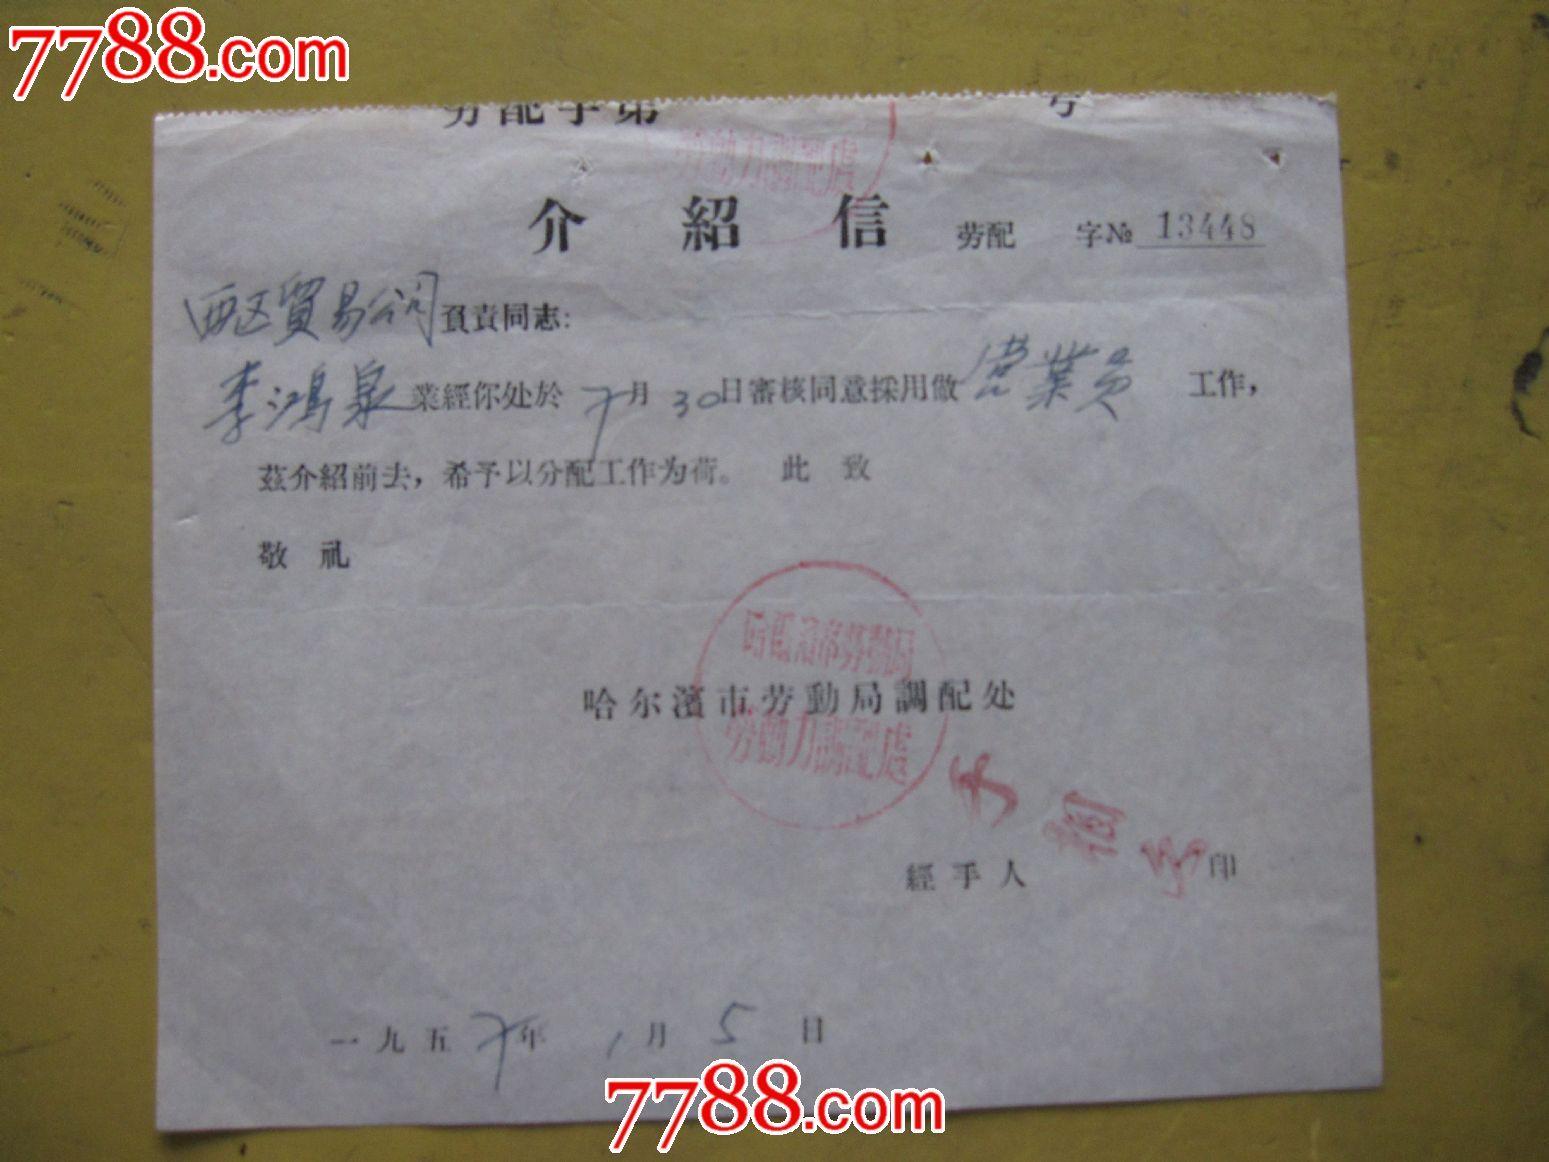 劳动局_哈尔滨劳动局调配处